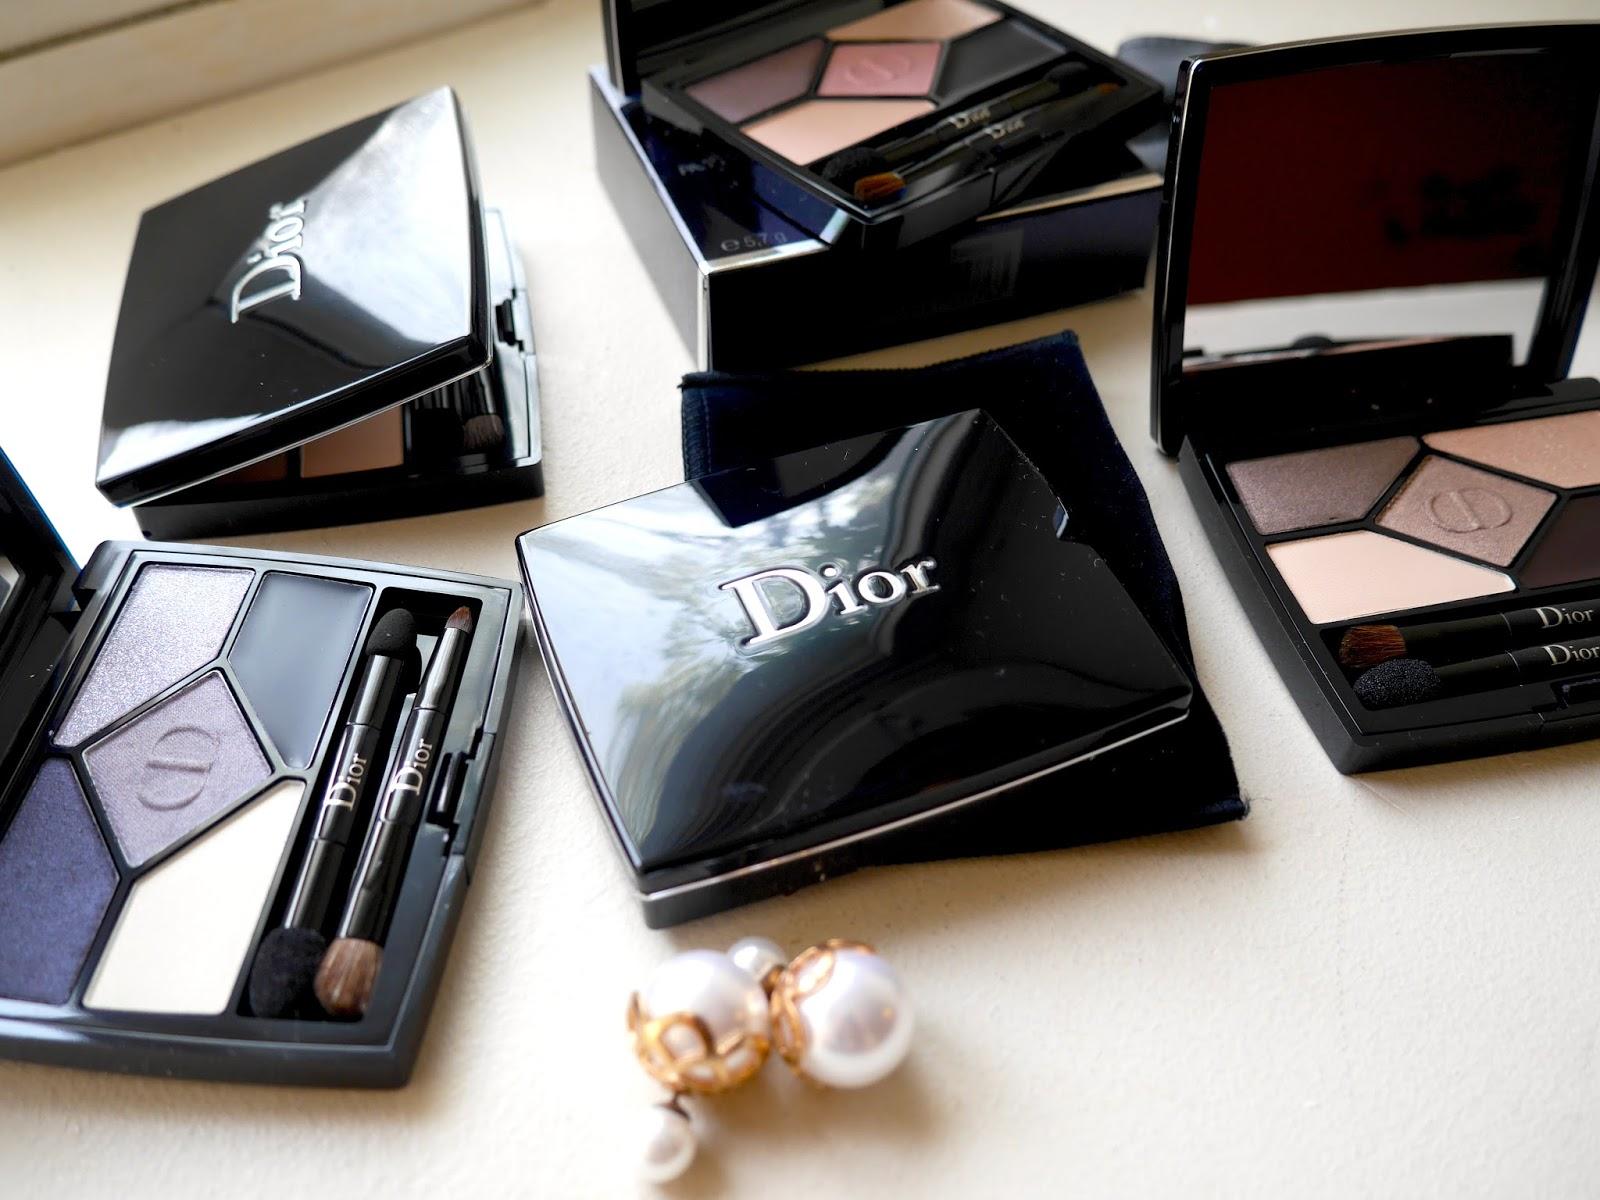 Nye øjenskyggepaletter fra Christian Dior